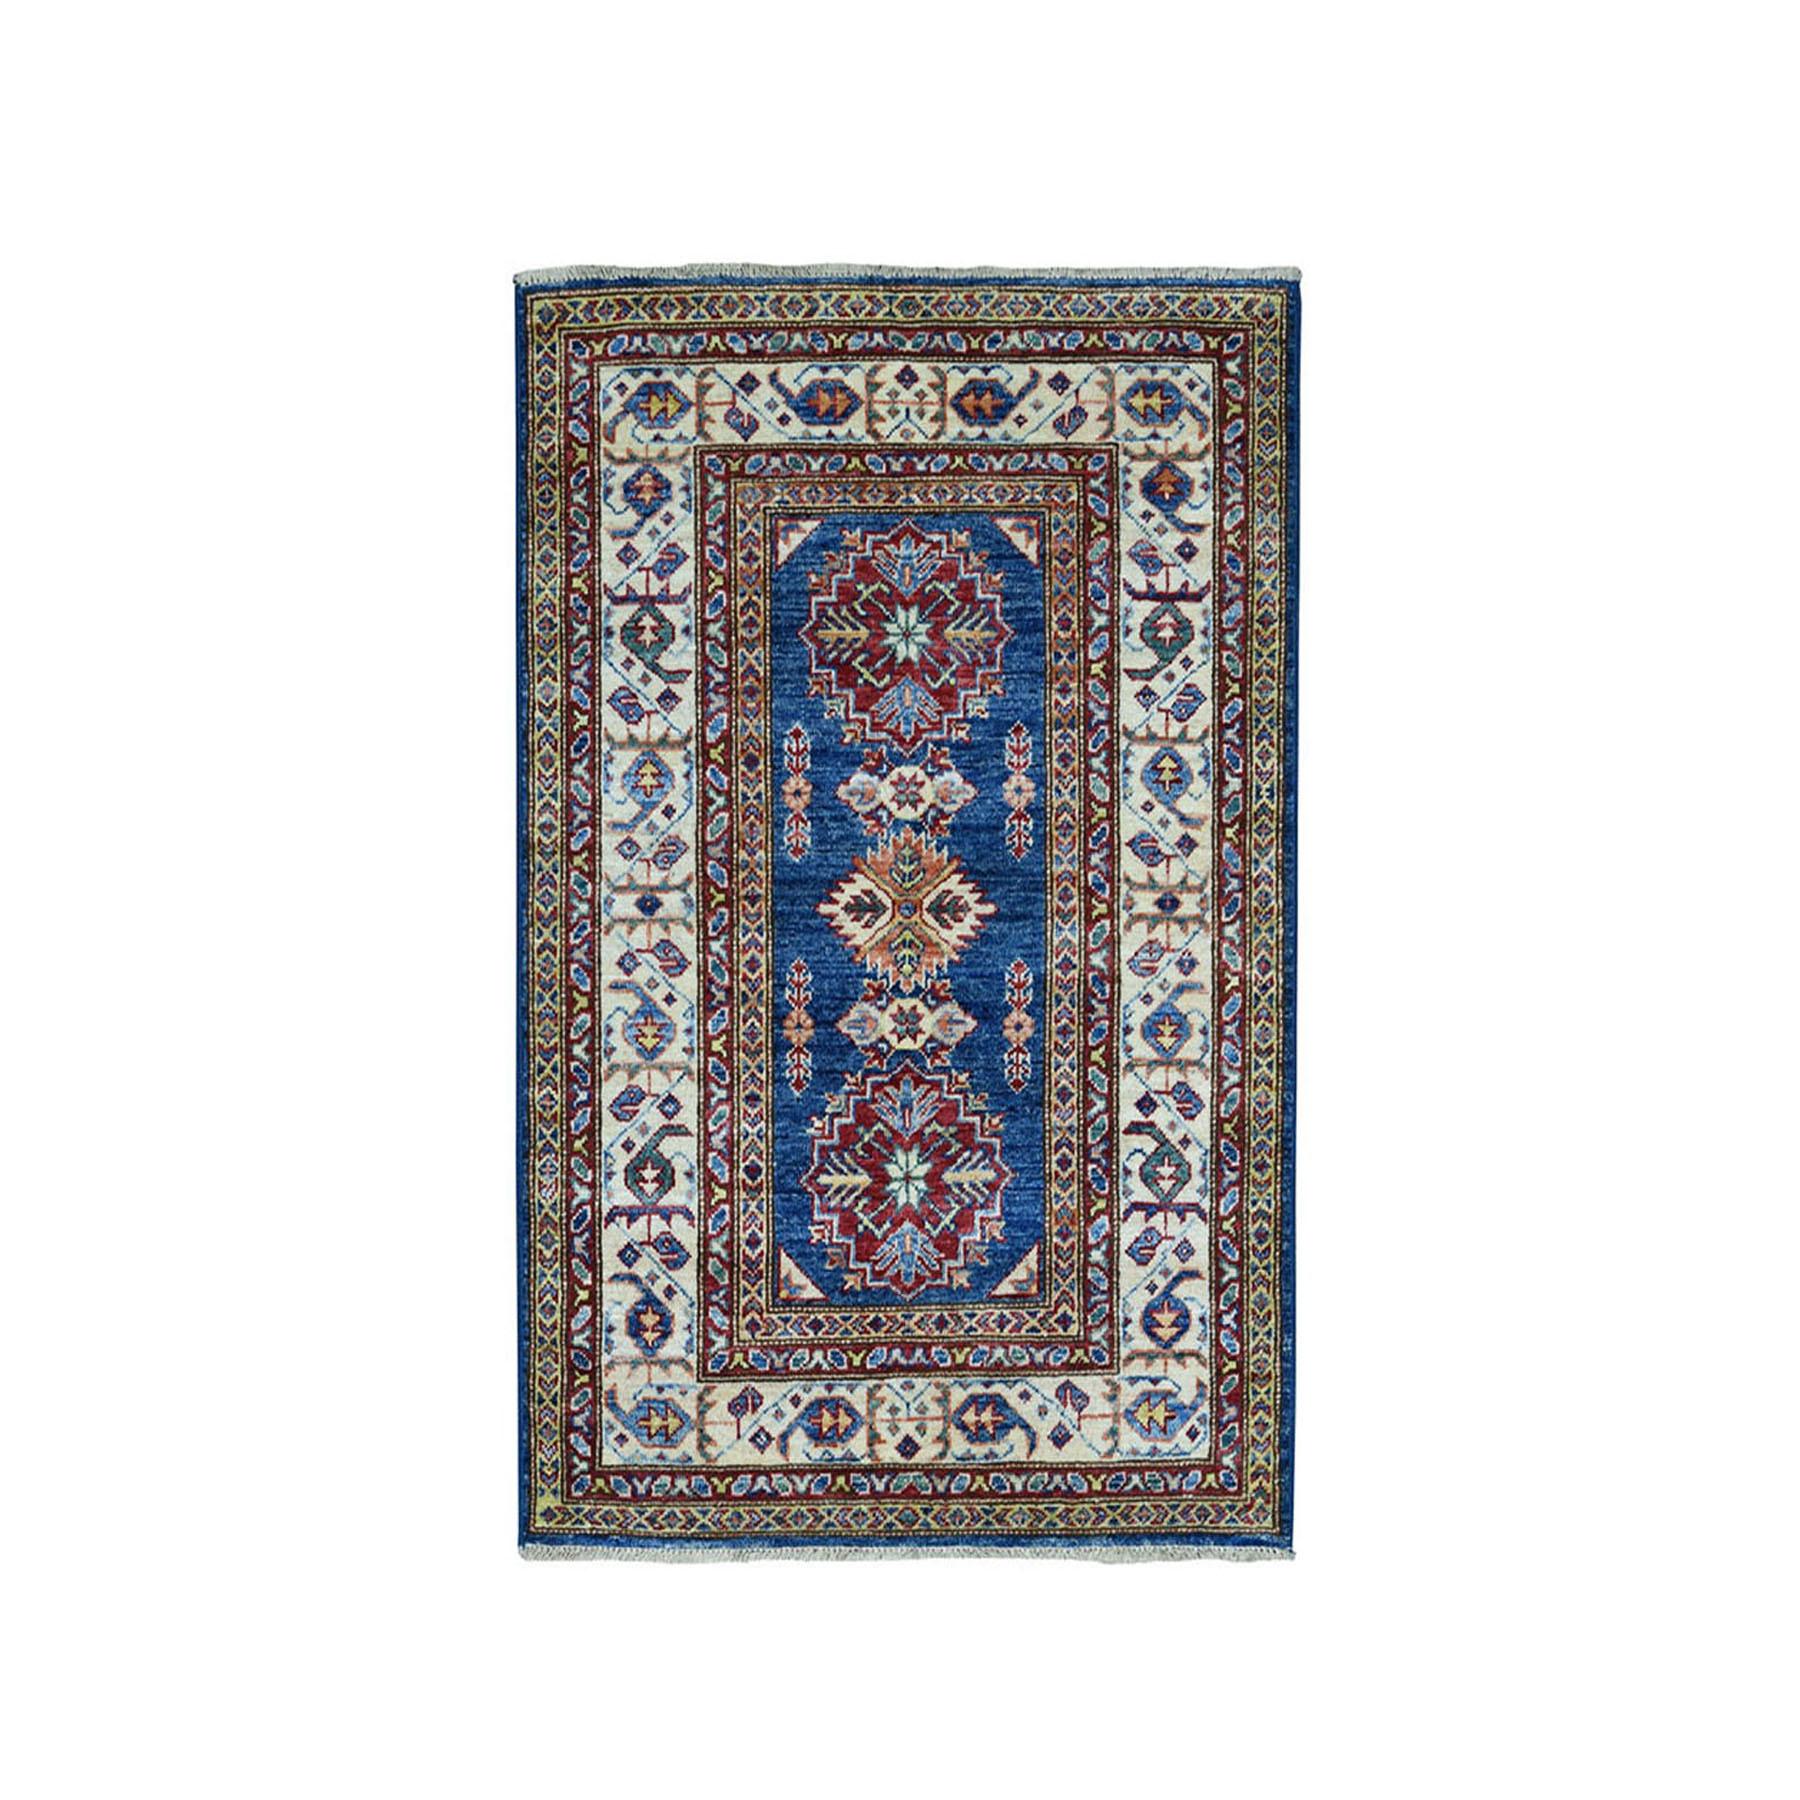 3'X4' Blue Super Kazak Pure Wool Geometric Design Hand-Knotted Oriental Rug moae0889